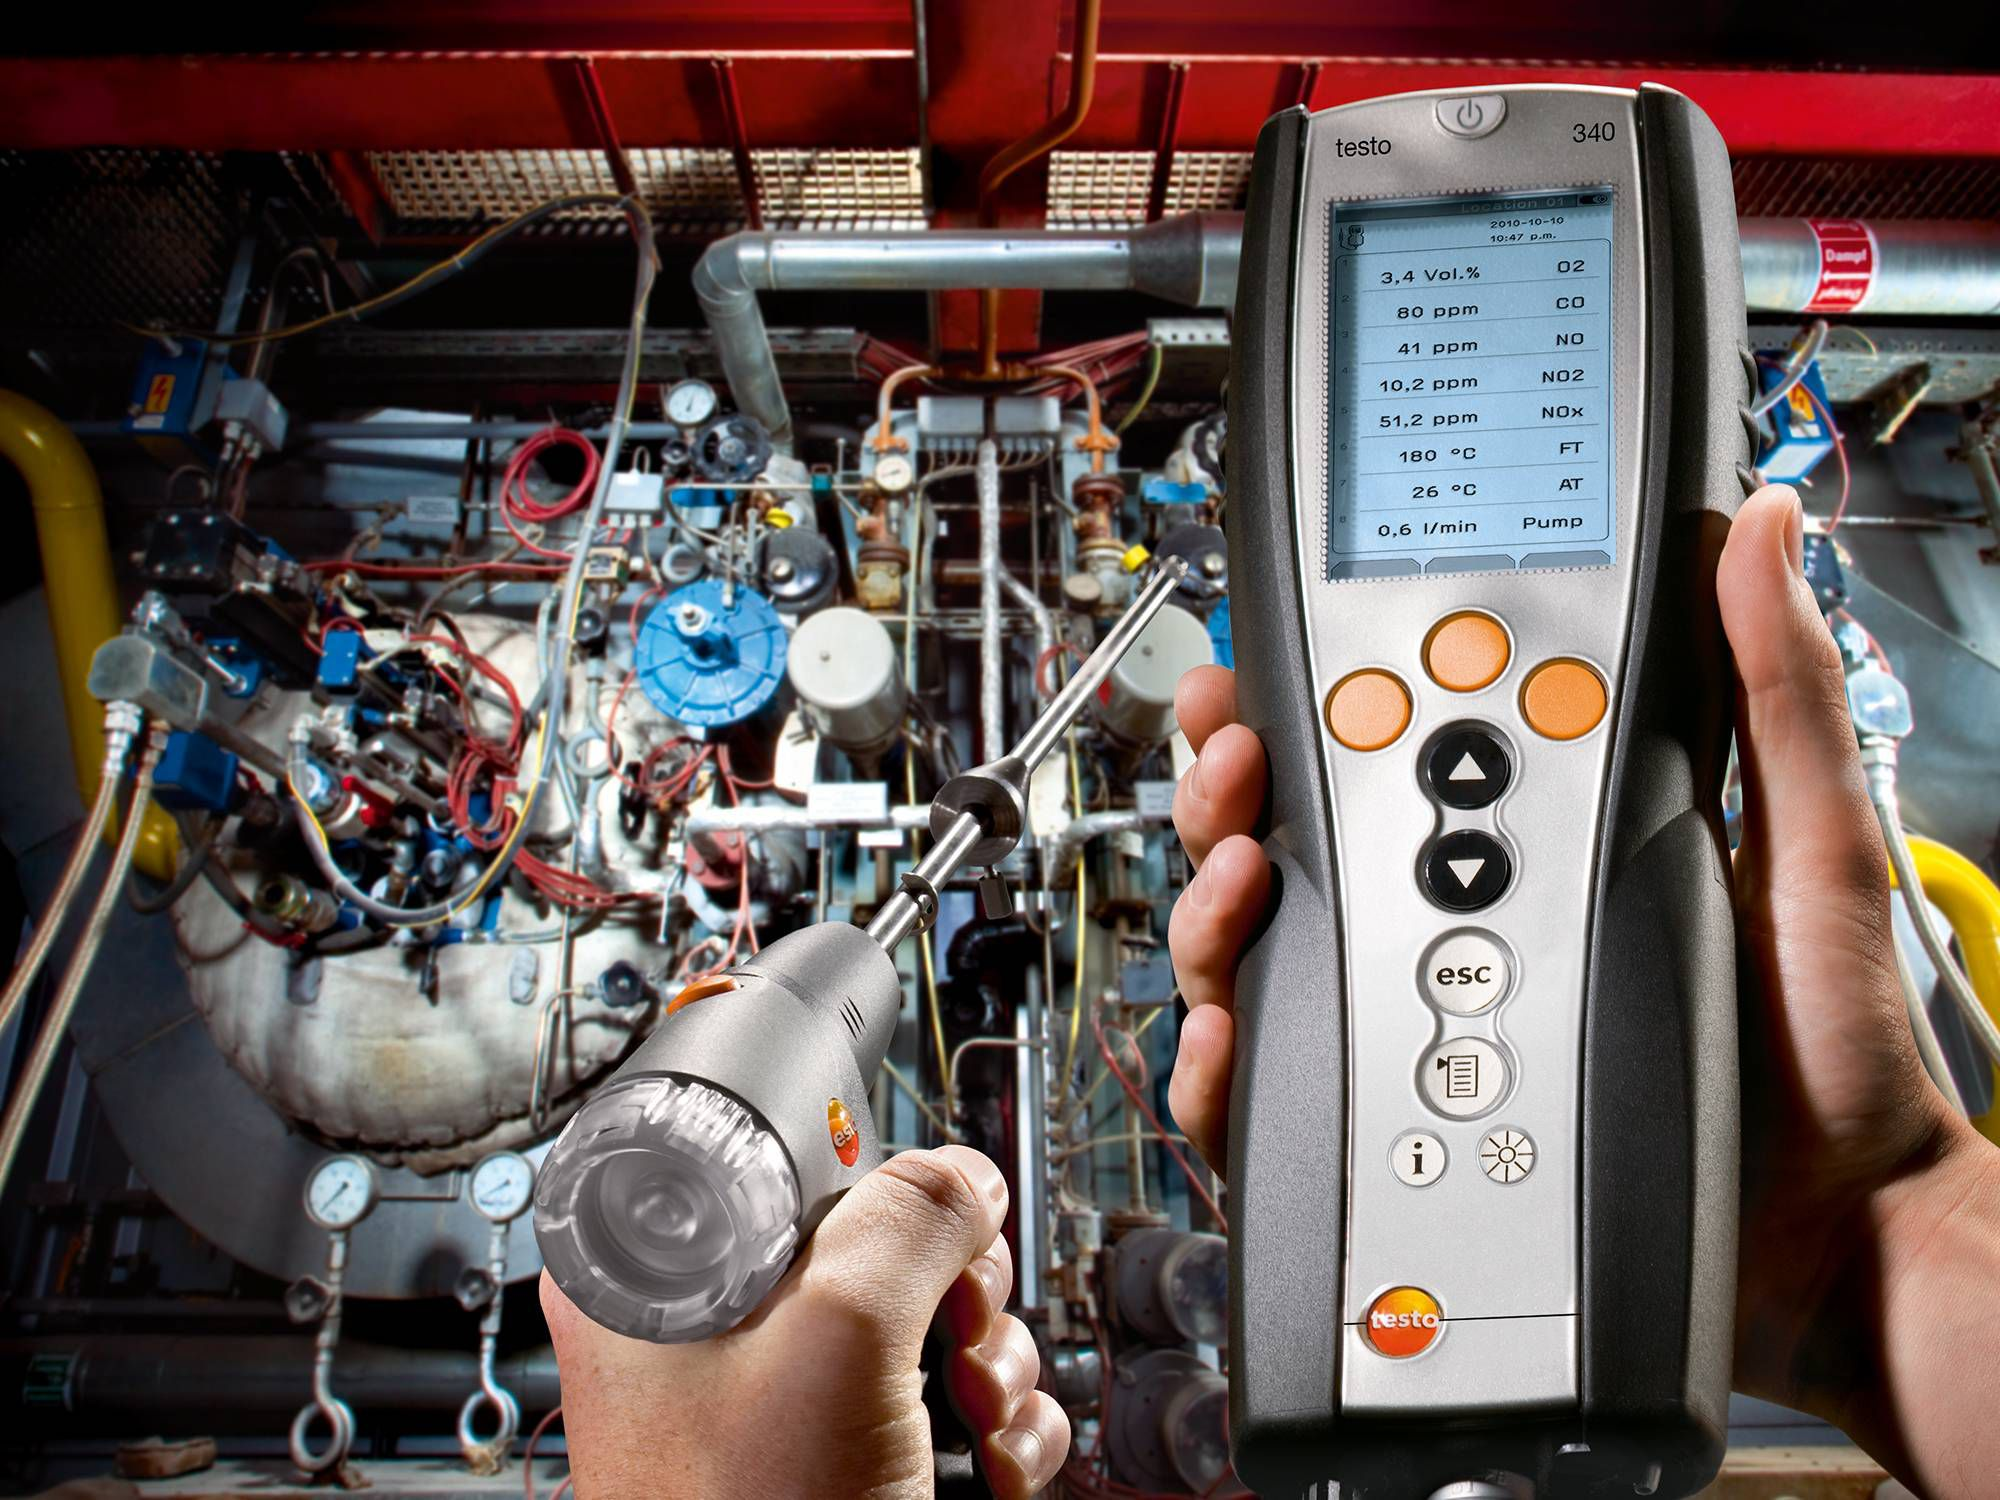 Flue gas analyzer testo 320